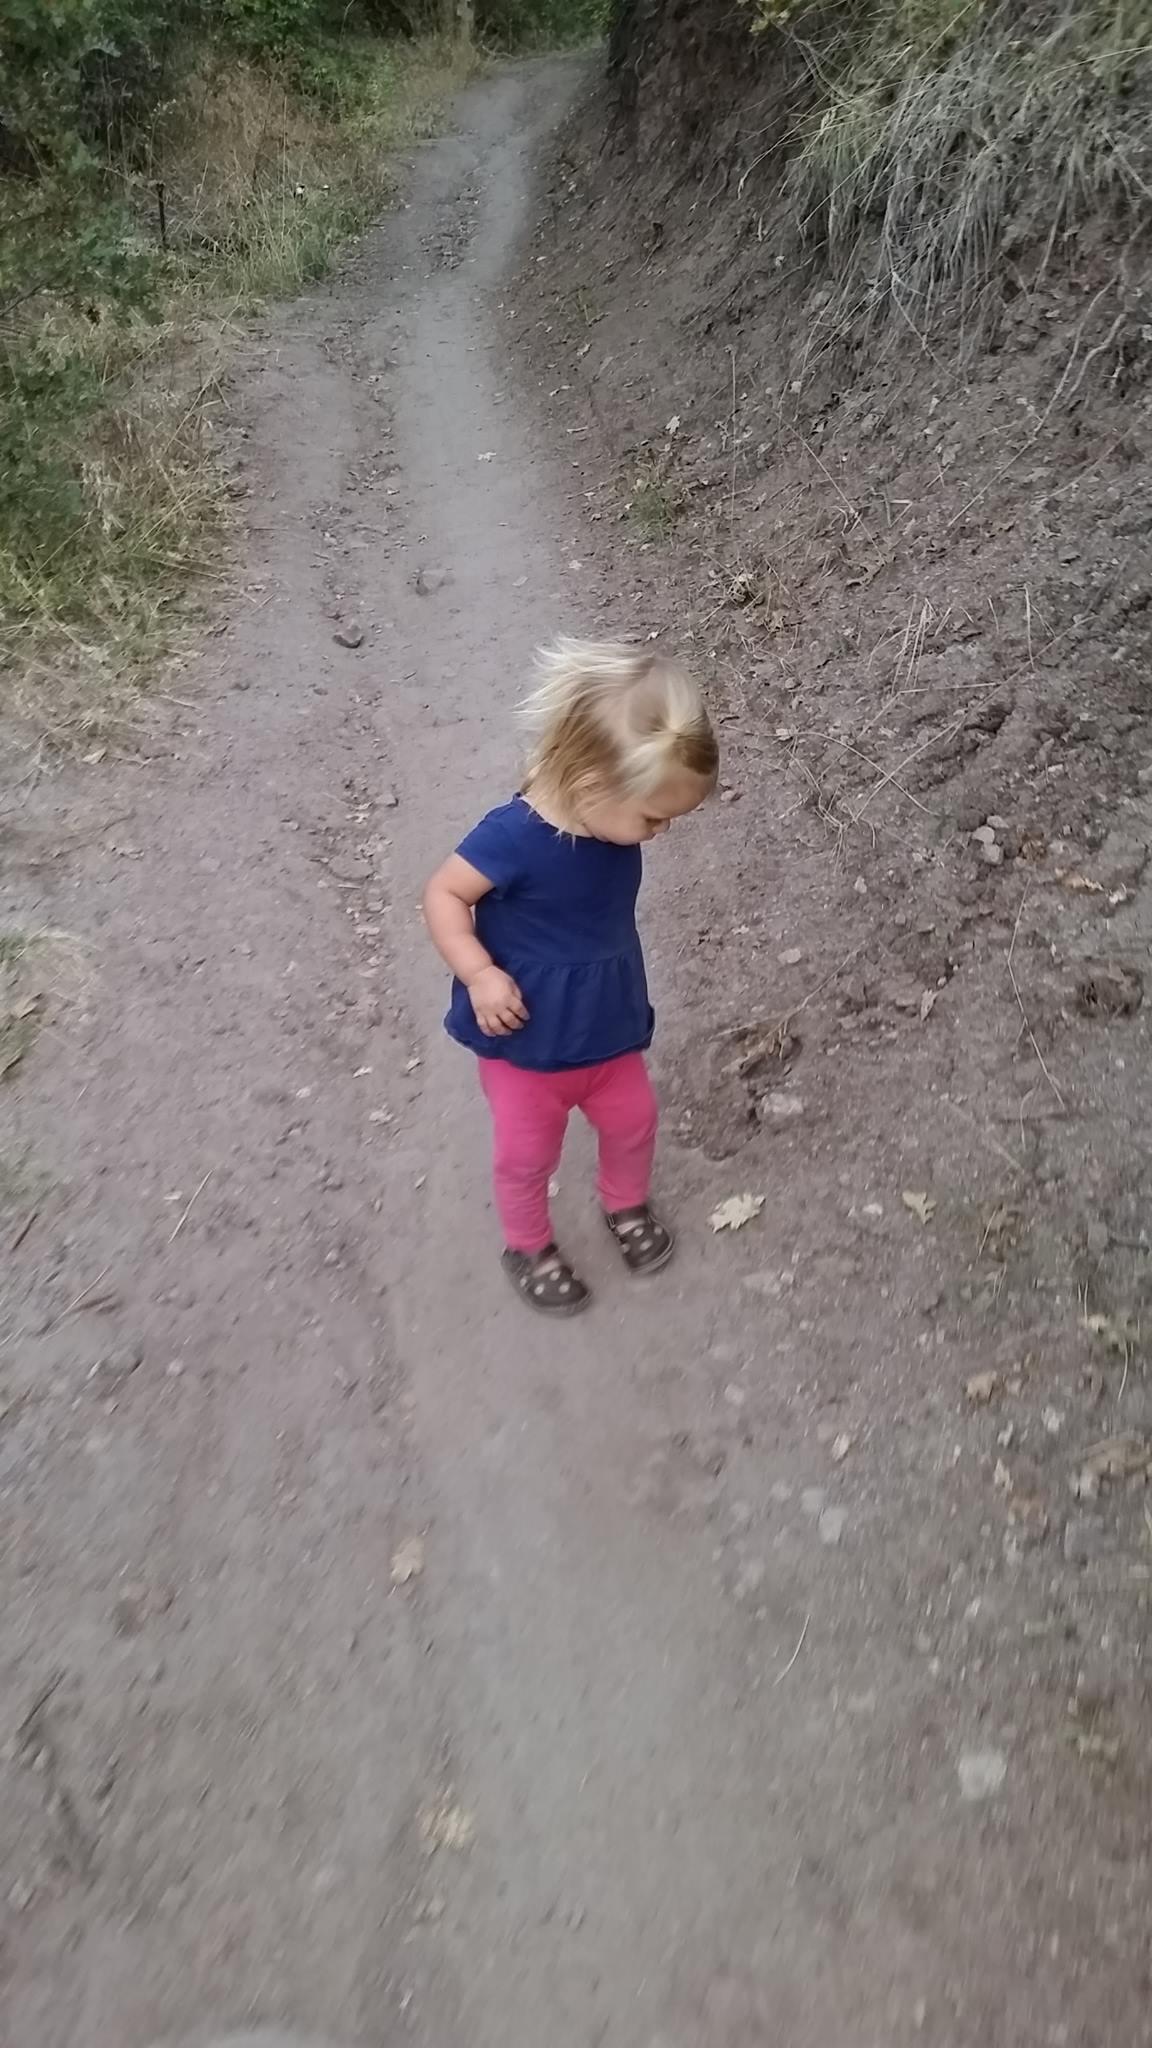 Hiking Through Life's Trials